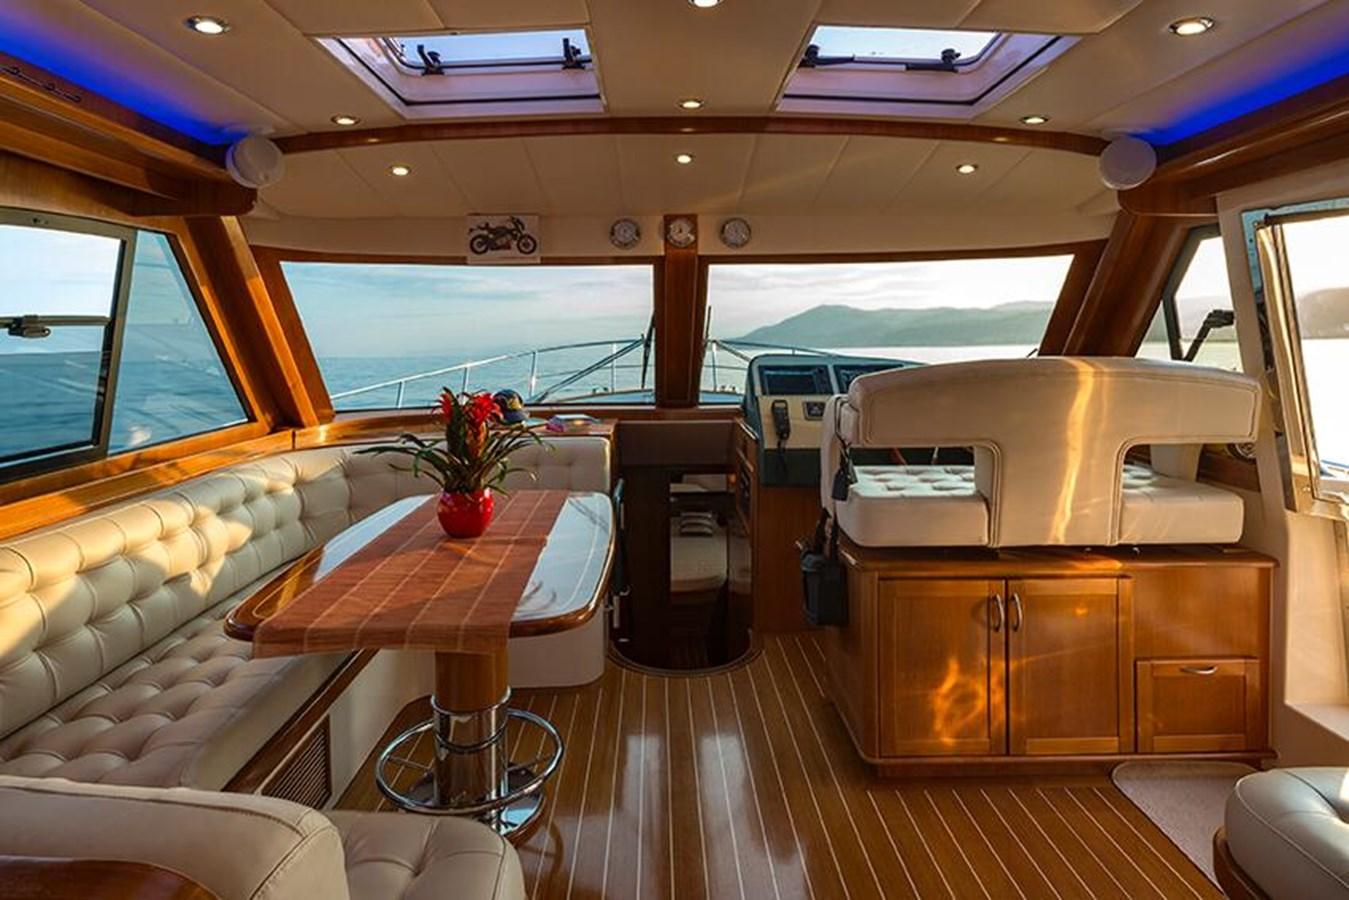 IMG-20200304-WA0018 2011 ABATI YACHTS kEYPORT 60 Motor Yacht 2879778